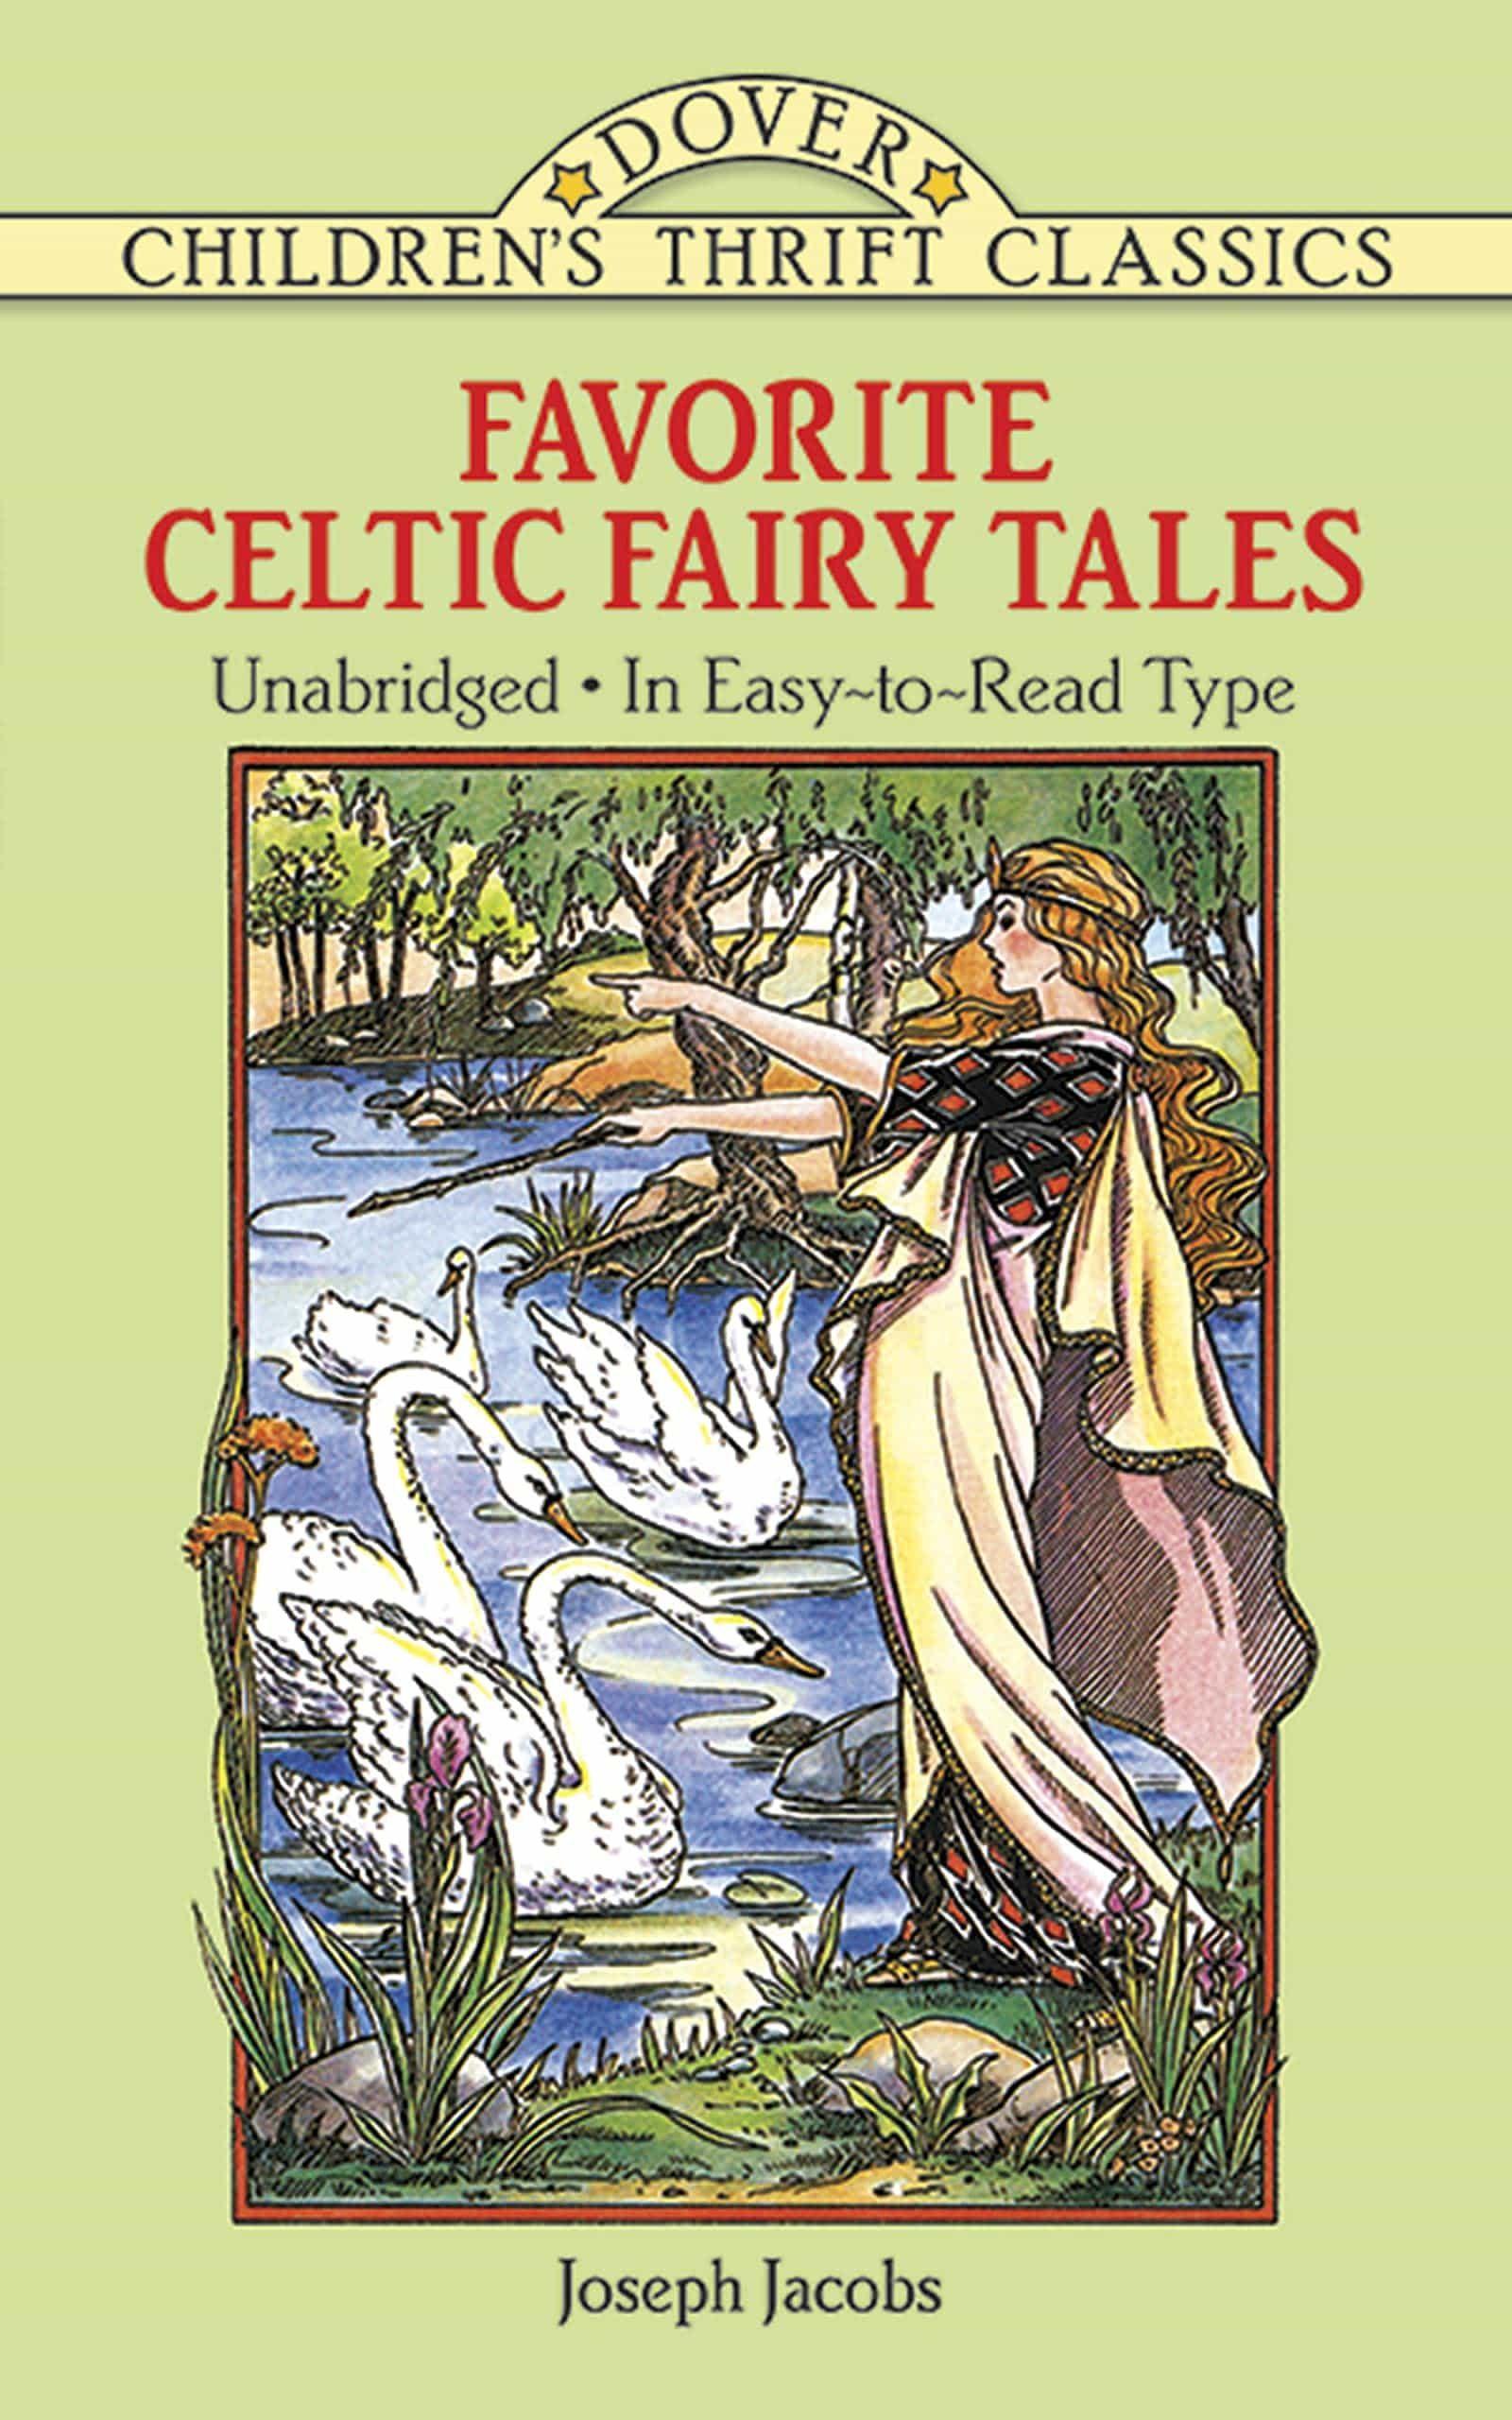 favorite celtic fairy tales-joseph jacobs-9780486283524